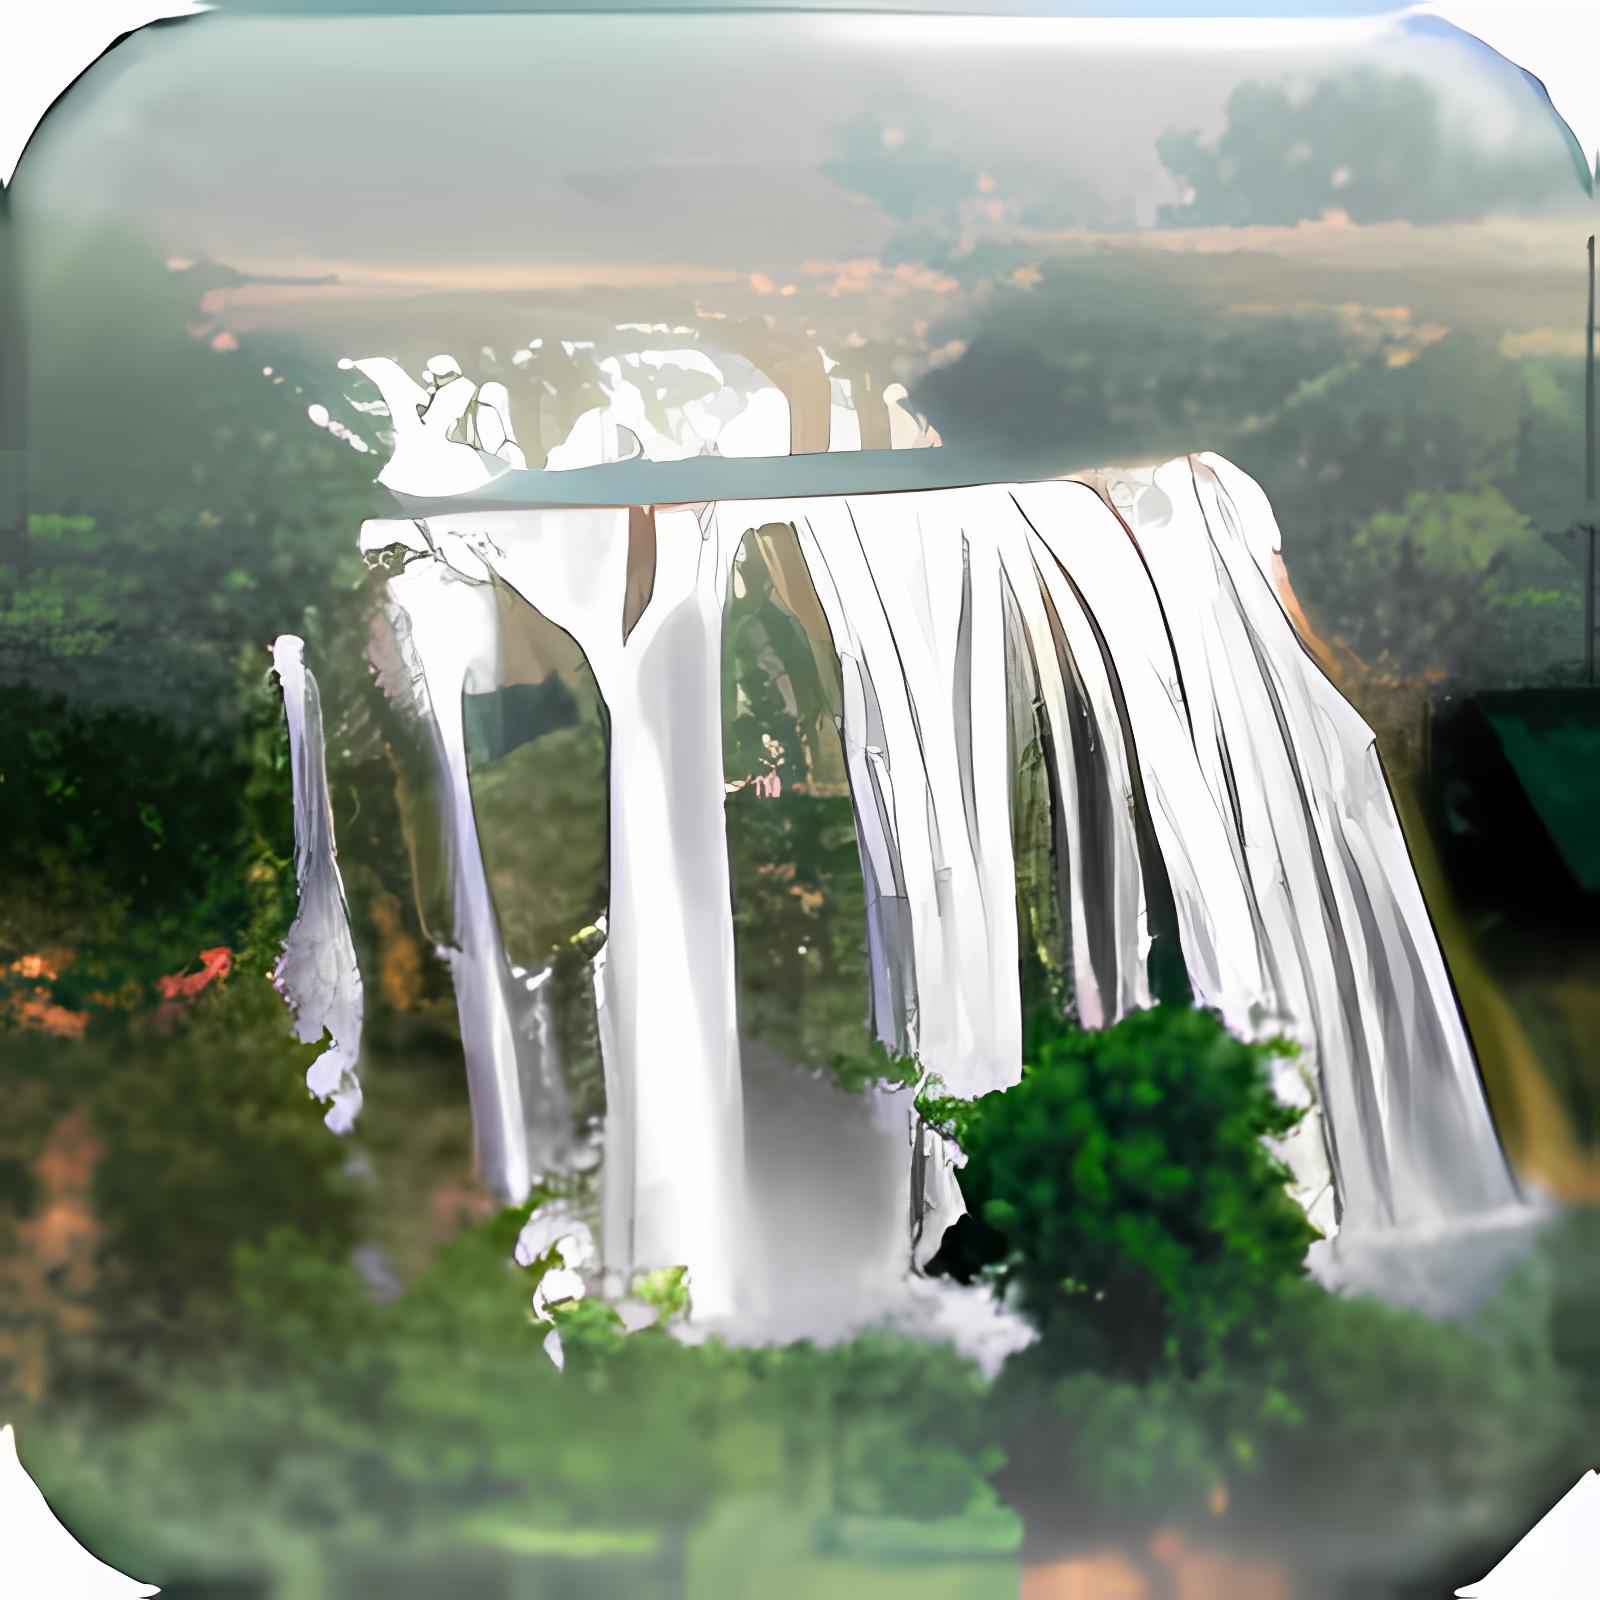 NFS Waterfalls 01